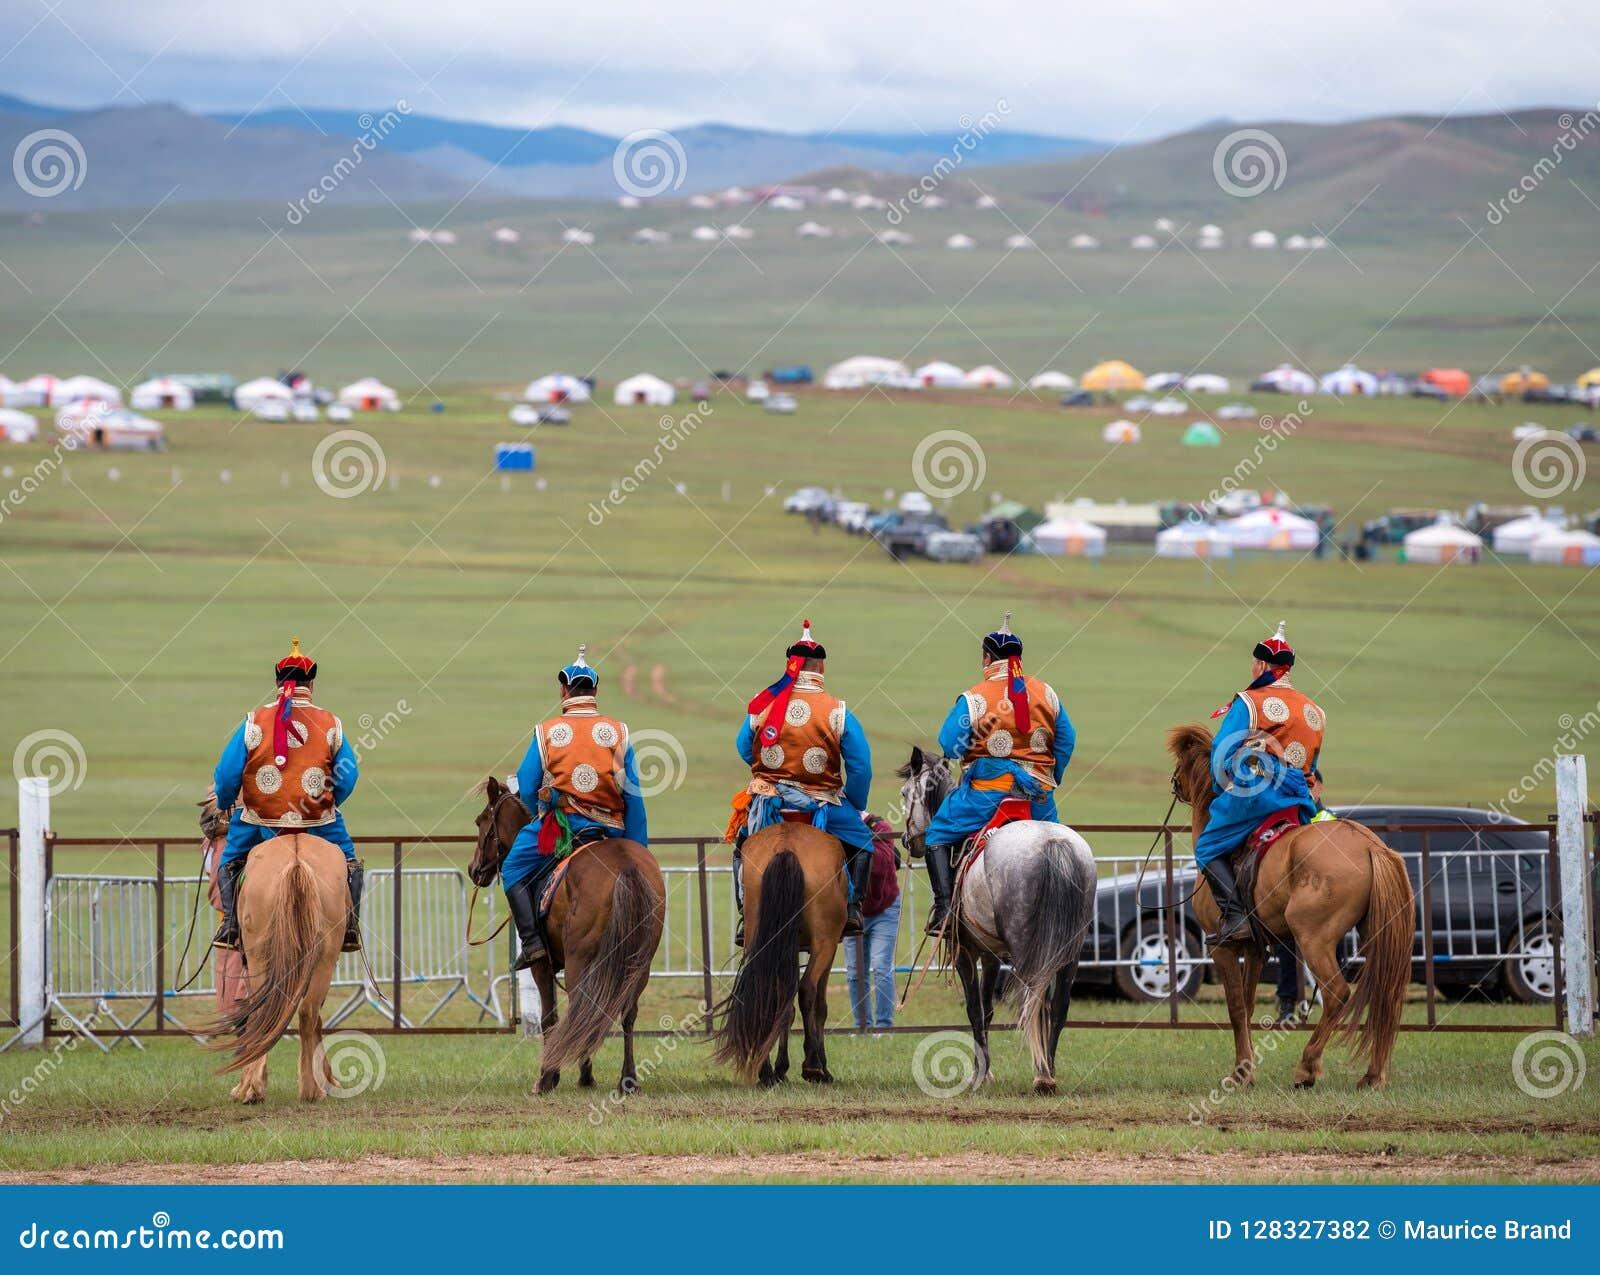 naadam-festival-horse-race-naadam-festiv